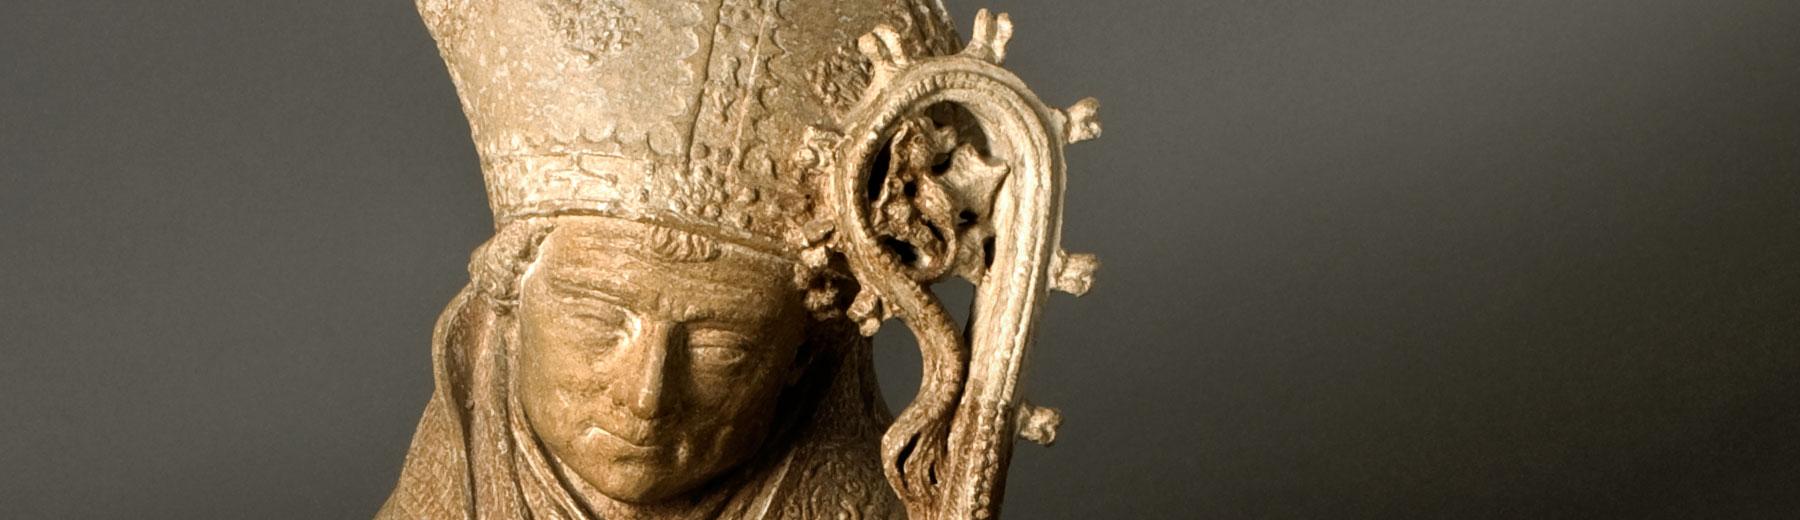 Holy bishop, avesnes stone, Brabant, ca. 1500(copyright: M - Museum Leuven   photography: Paul Laes)